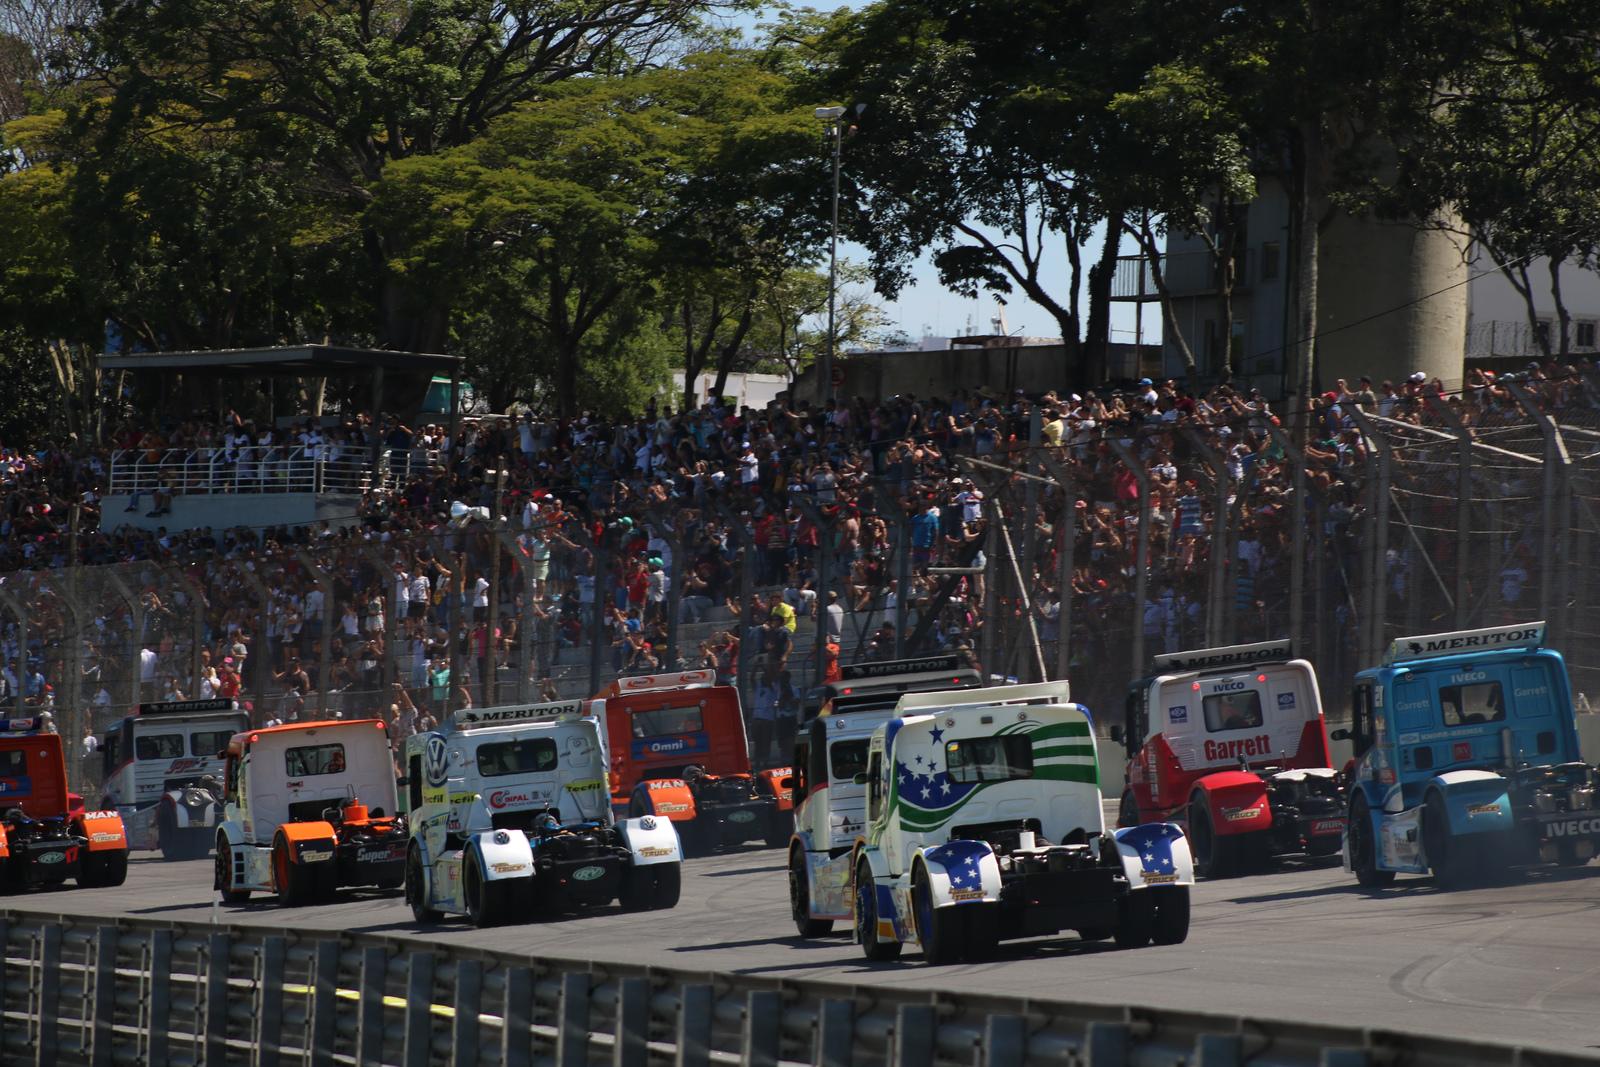 Foto de Galeria de fotos da Corrida 01 da Copa Truck em Interlagos, fotos de Deborah Almeida